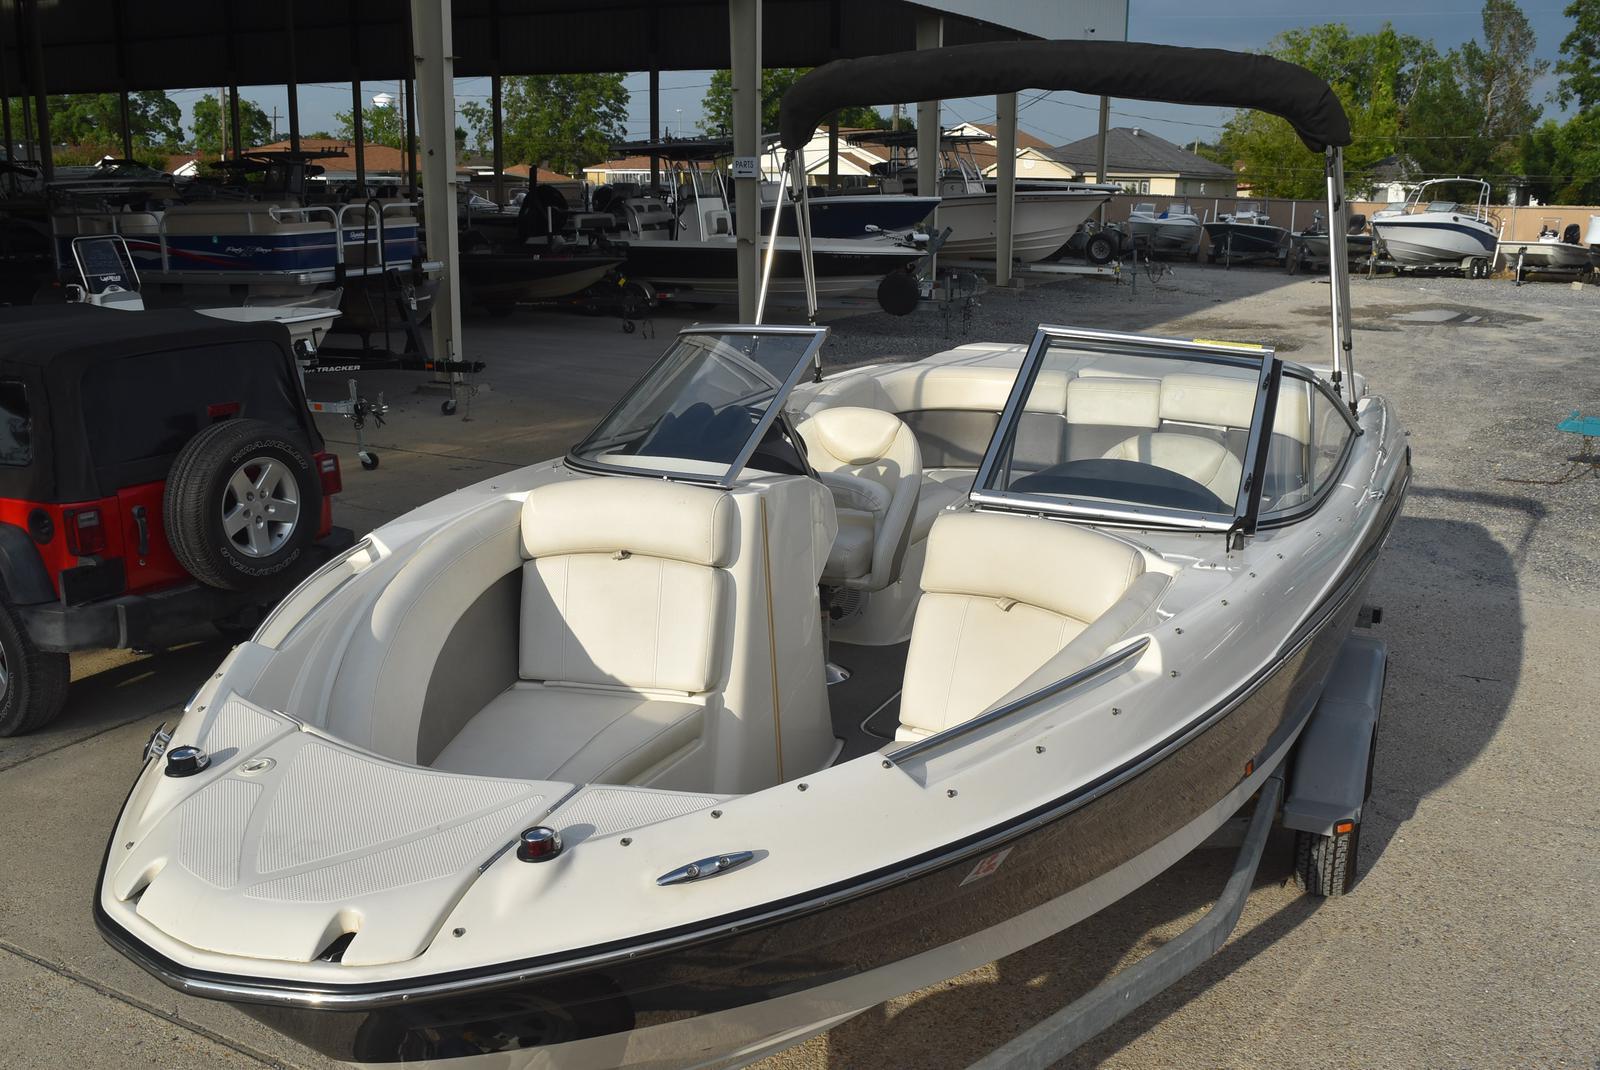 2010 Bayliner boat for sale, model of the boat is 235BR & Image # 11 of 43